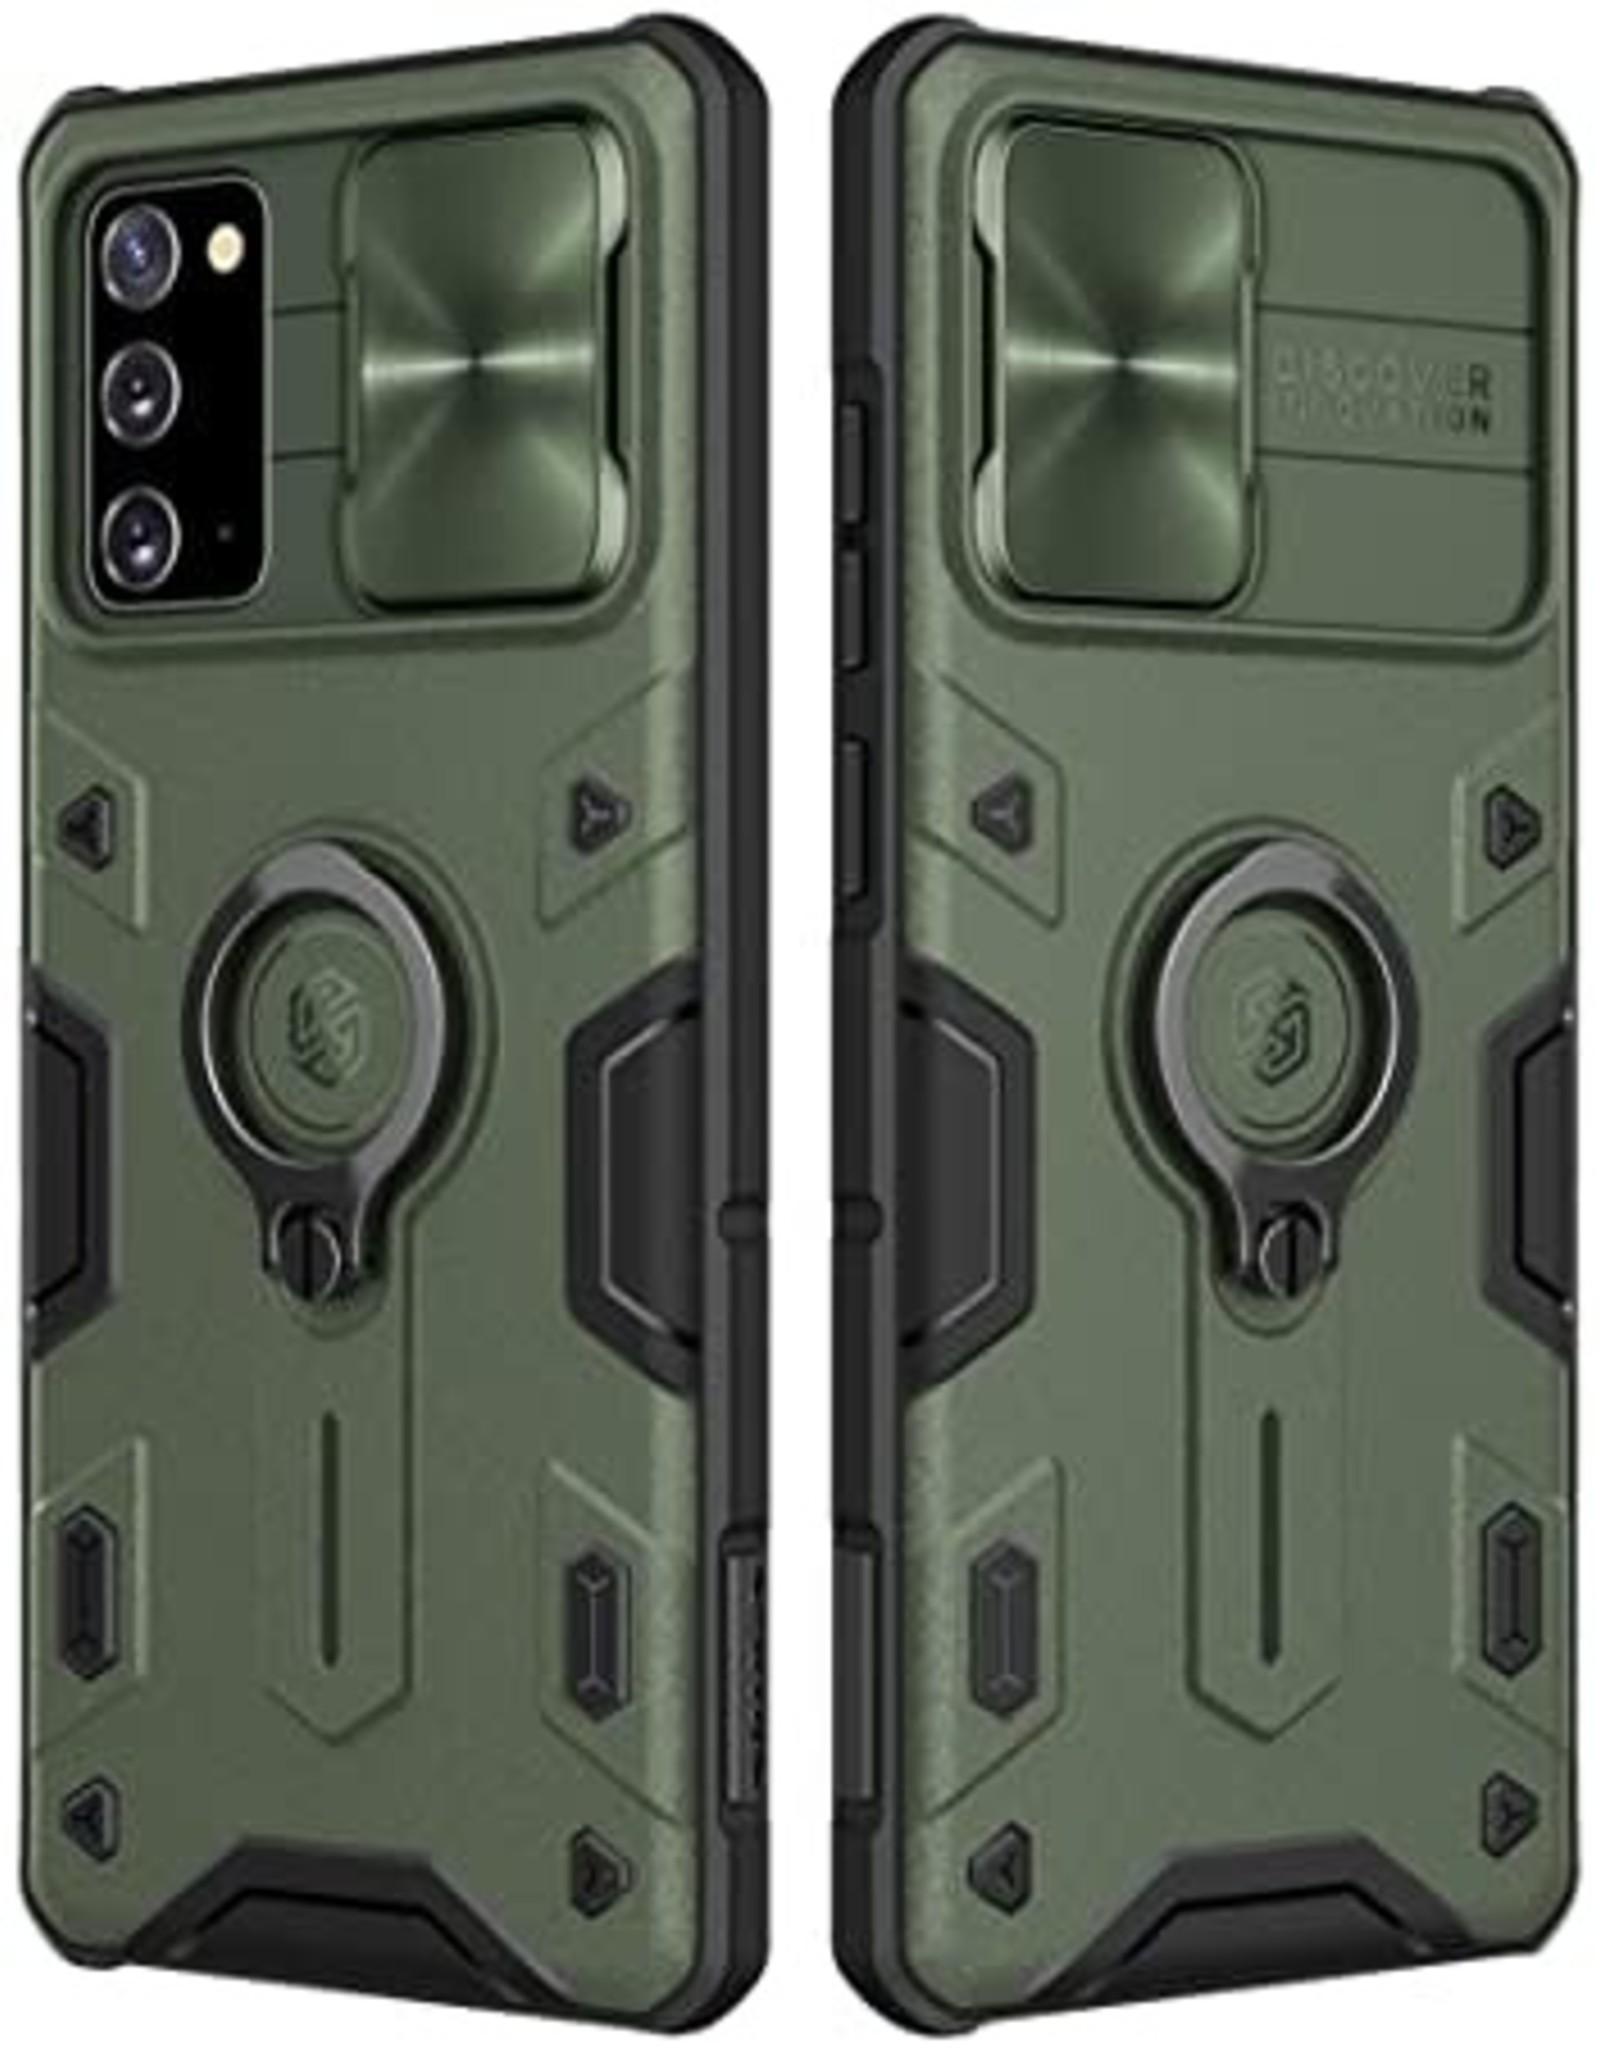 Nillkin NILLKIN CamShield PC TPU with Ring Kickstand Case Note 20 Green